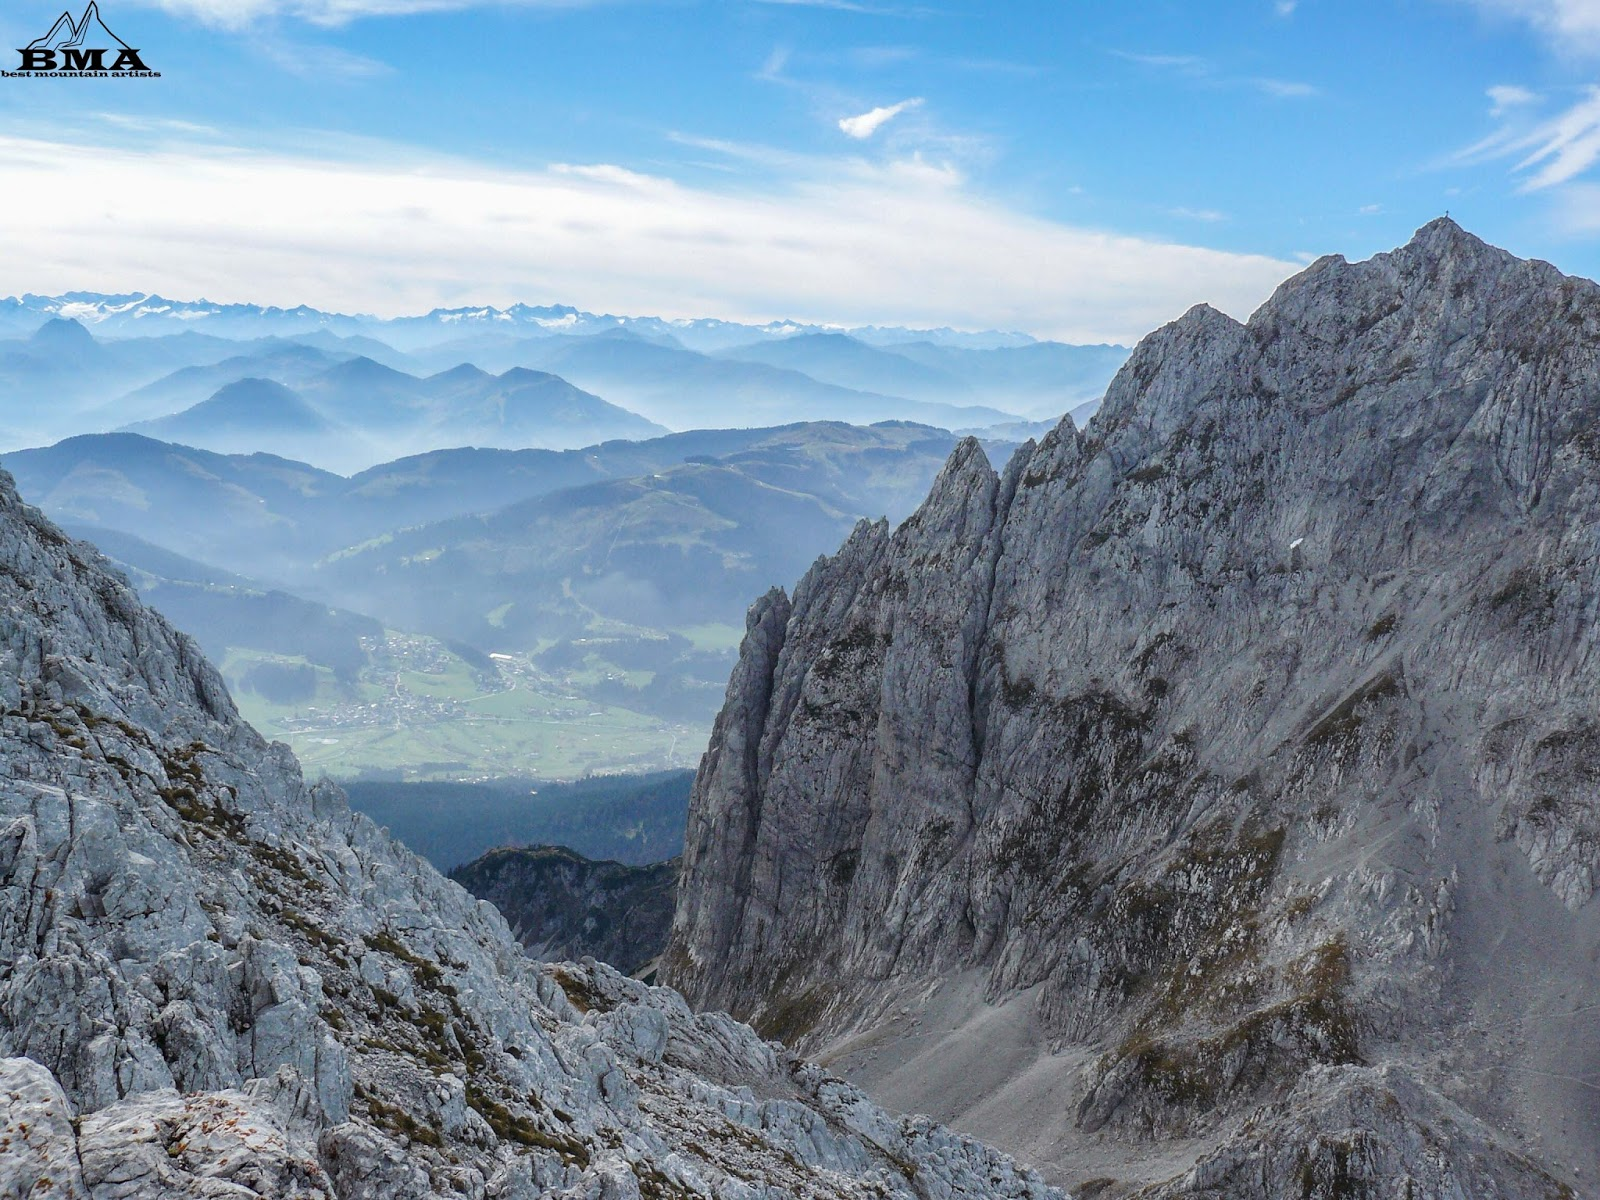 Klettersteig Wilder Kaiser Ellmauer Halt : Bergtour hintere goinger halt kaiserbachtal